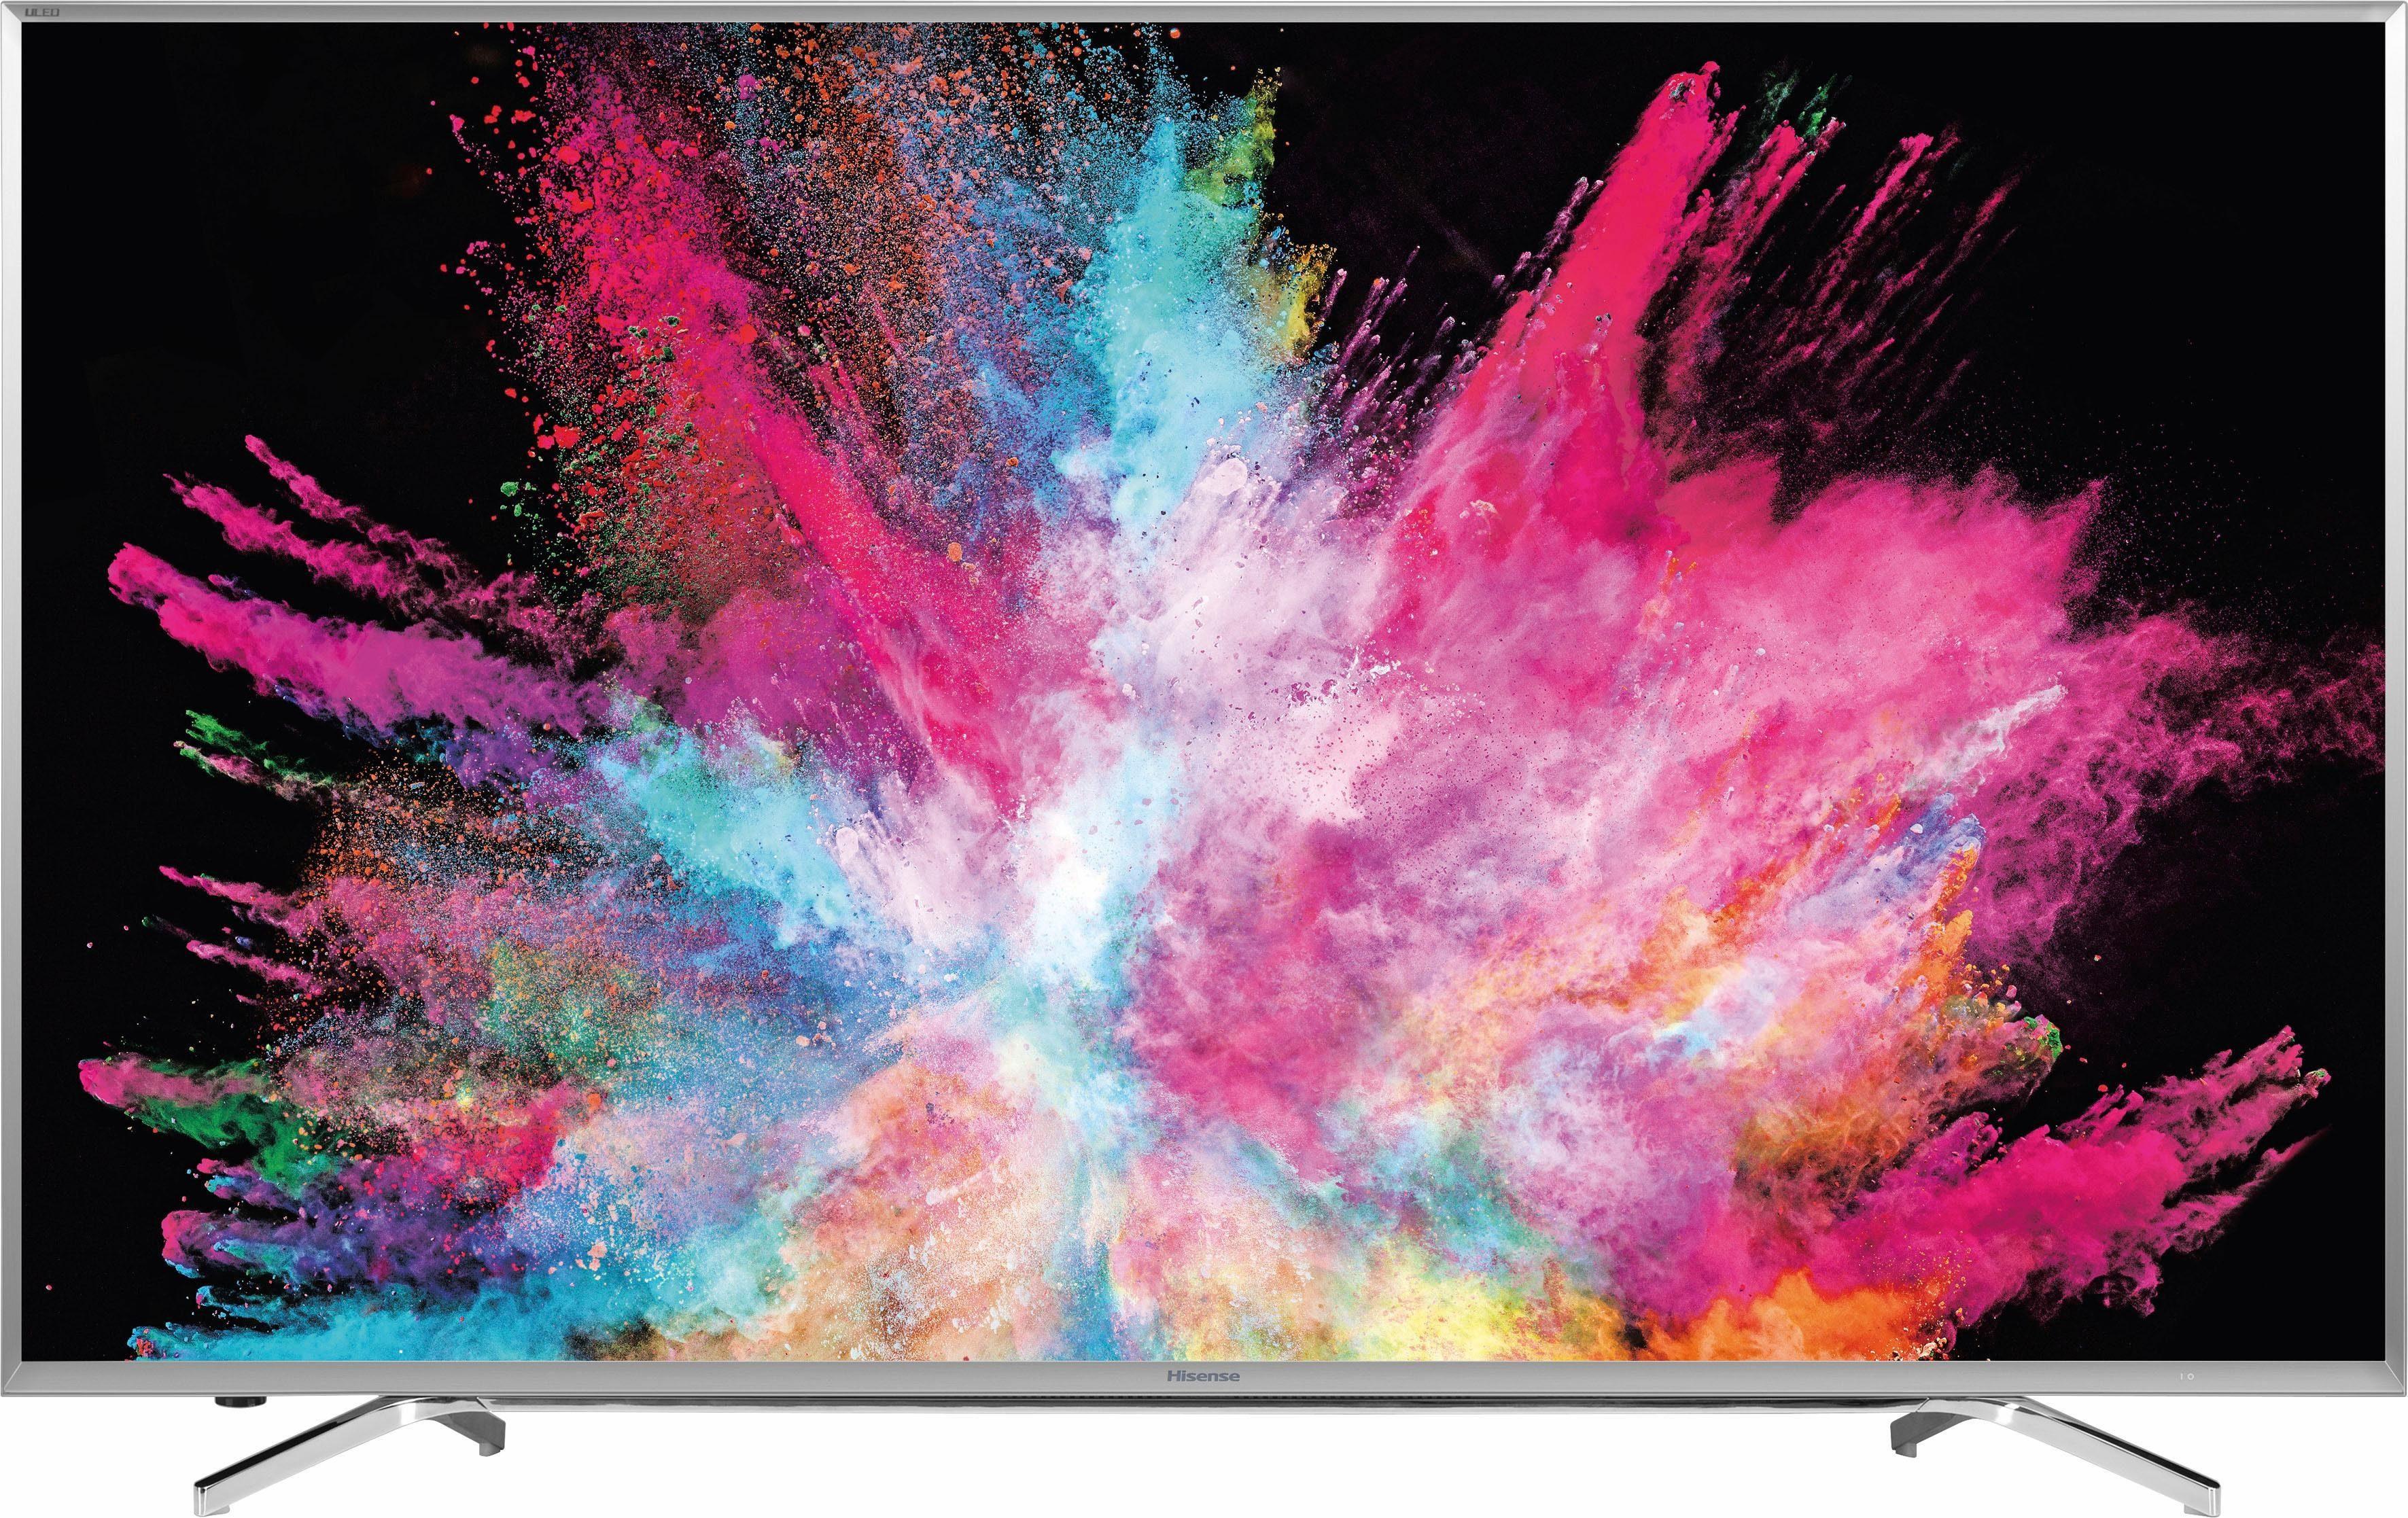 Hisense H65M7000 LED-Fernseher (163 cm/65 Zoll, Smart-TV)